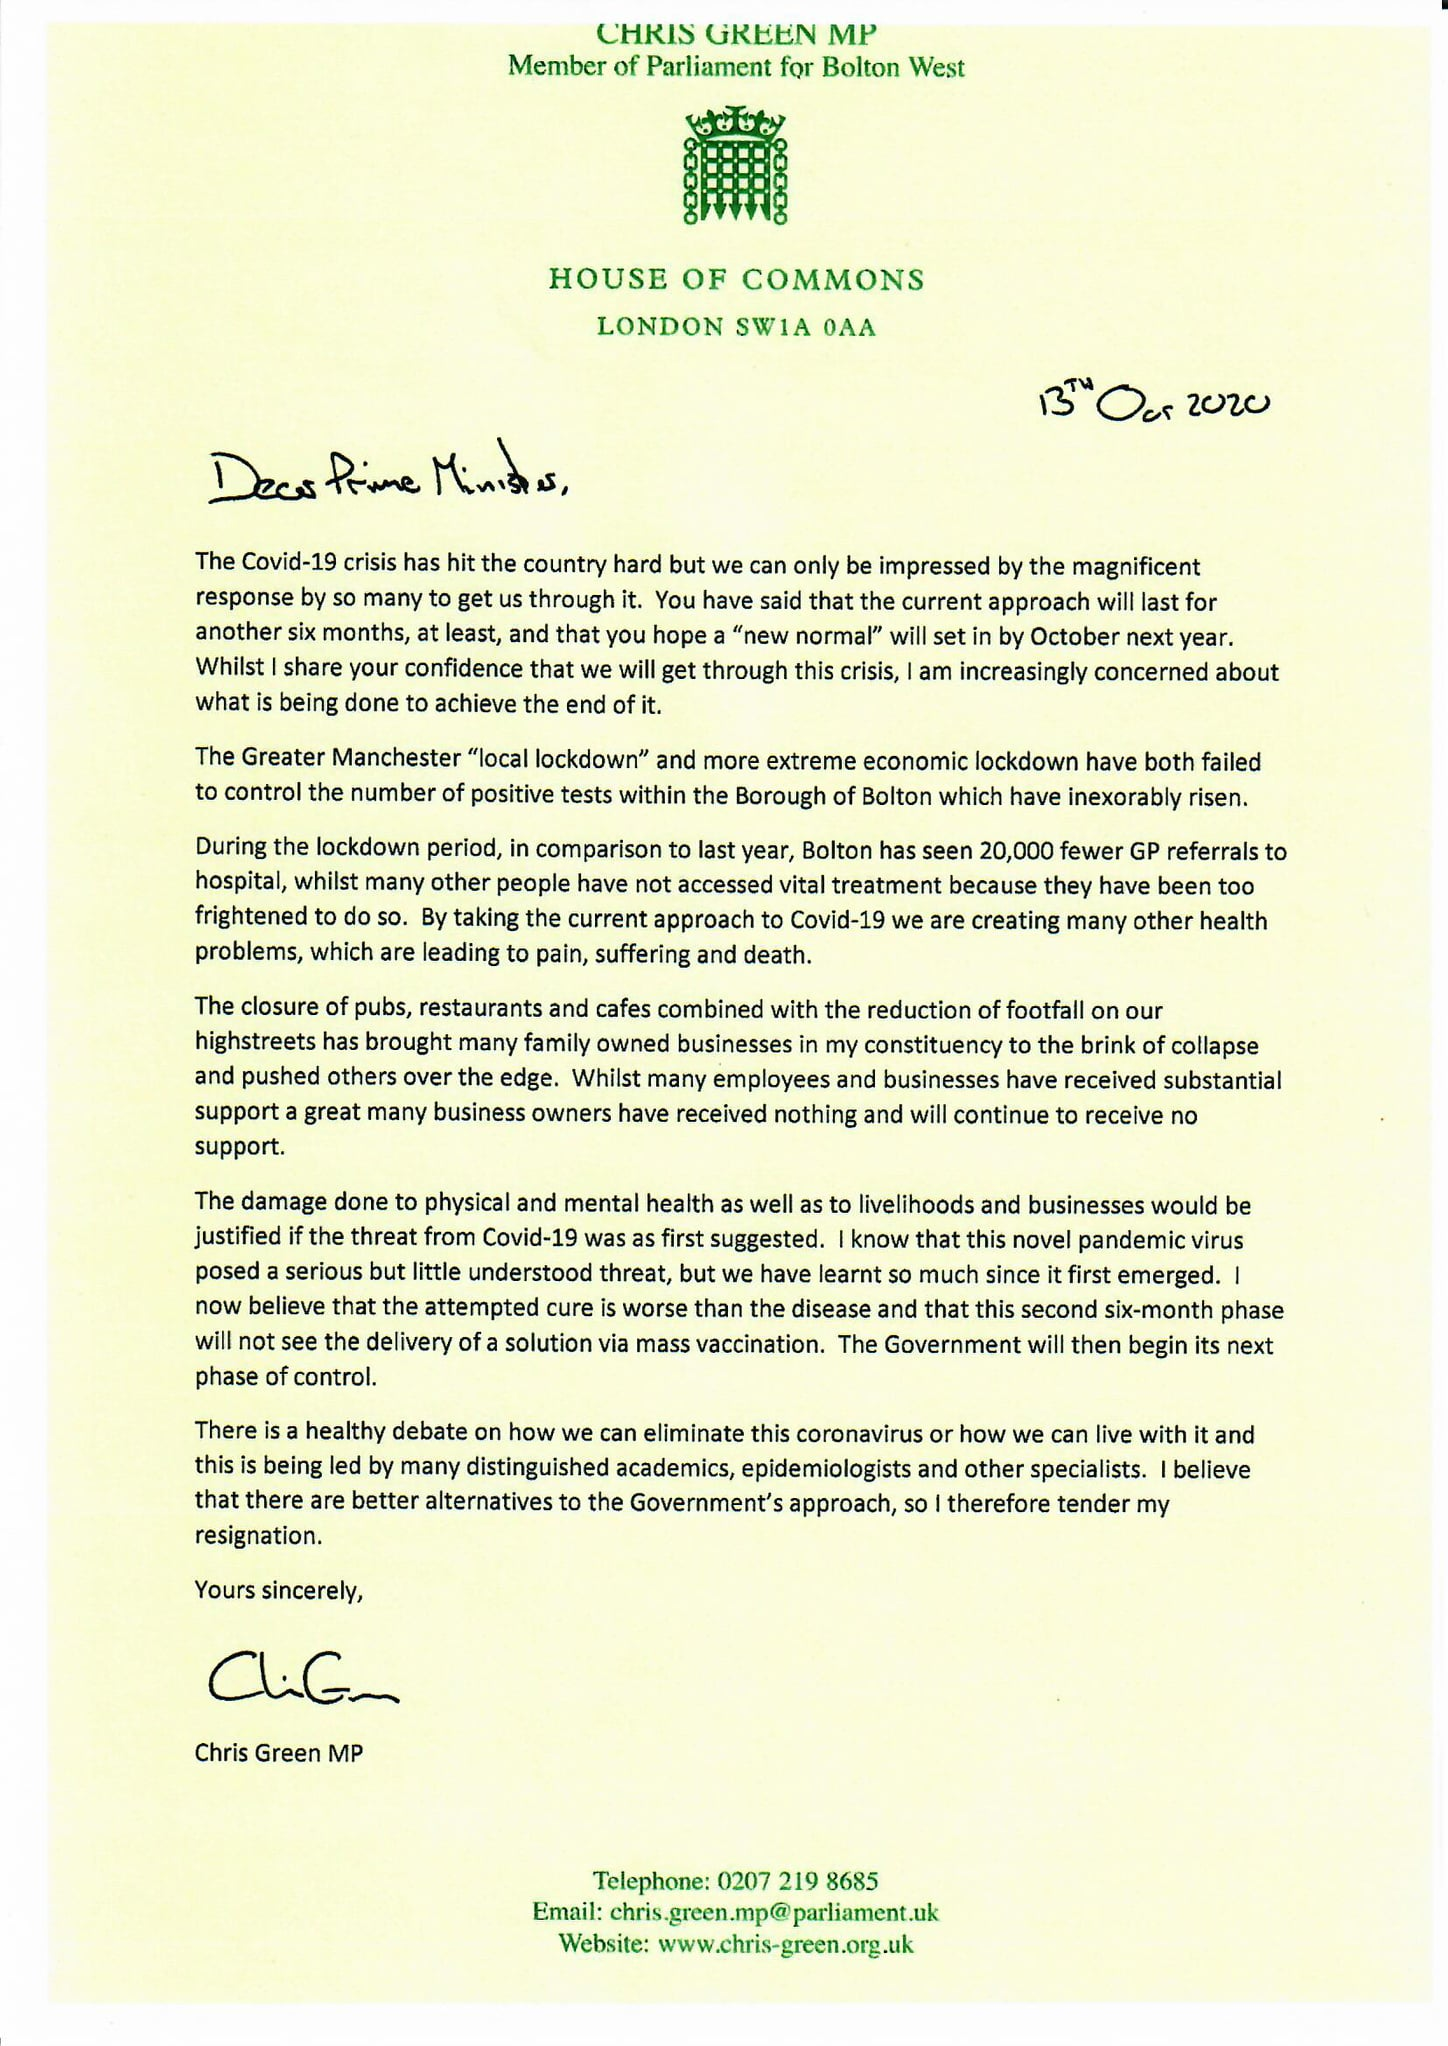 MP Chris Green resigns as Parliamentary Private Secretary